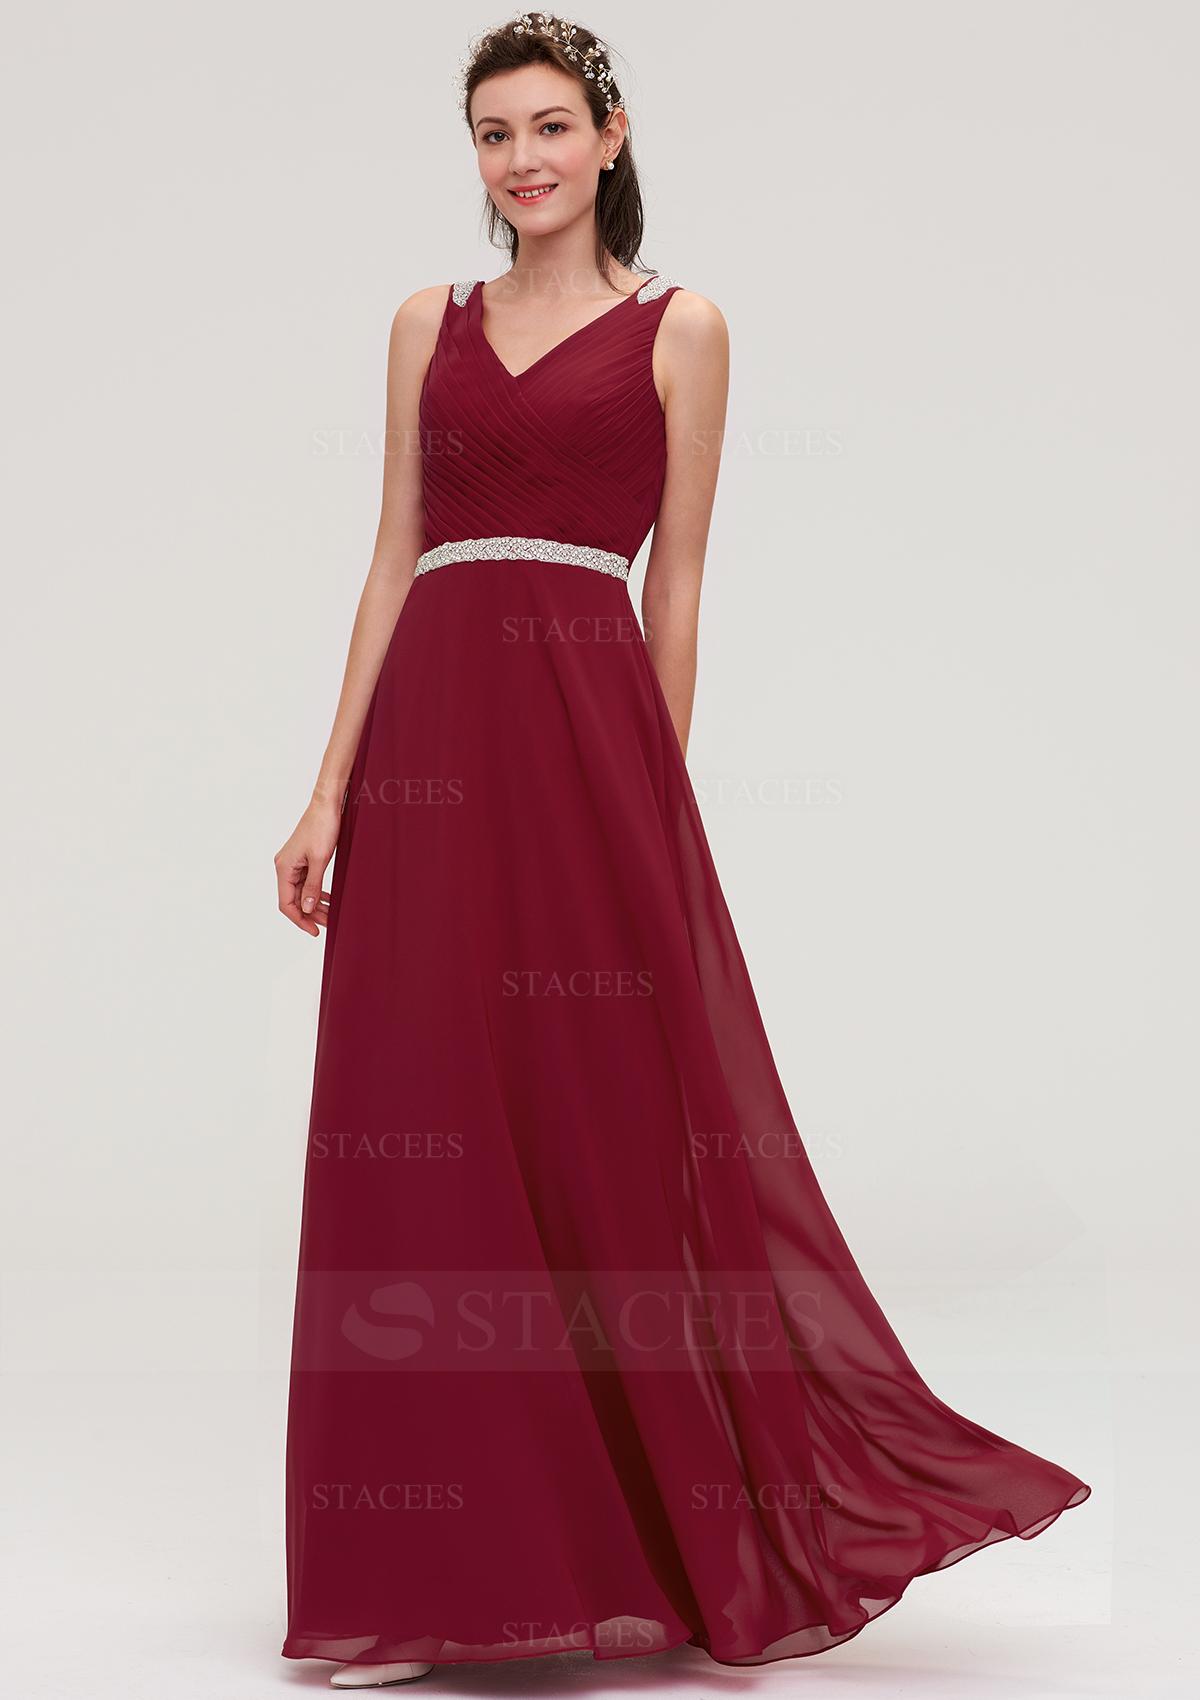 b9360fae5096 A-line/Princess V Neck Sleeveless Long/Floor-Length Chiffon ...